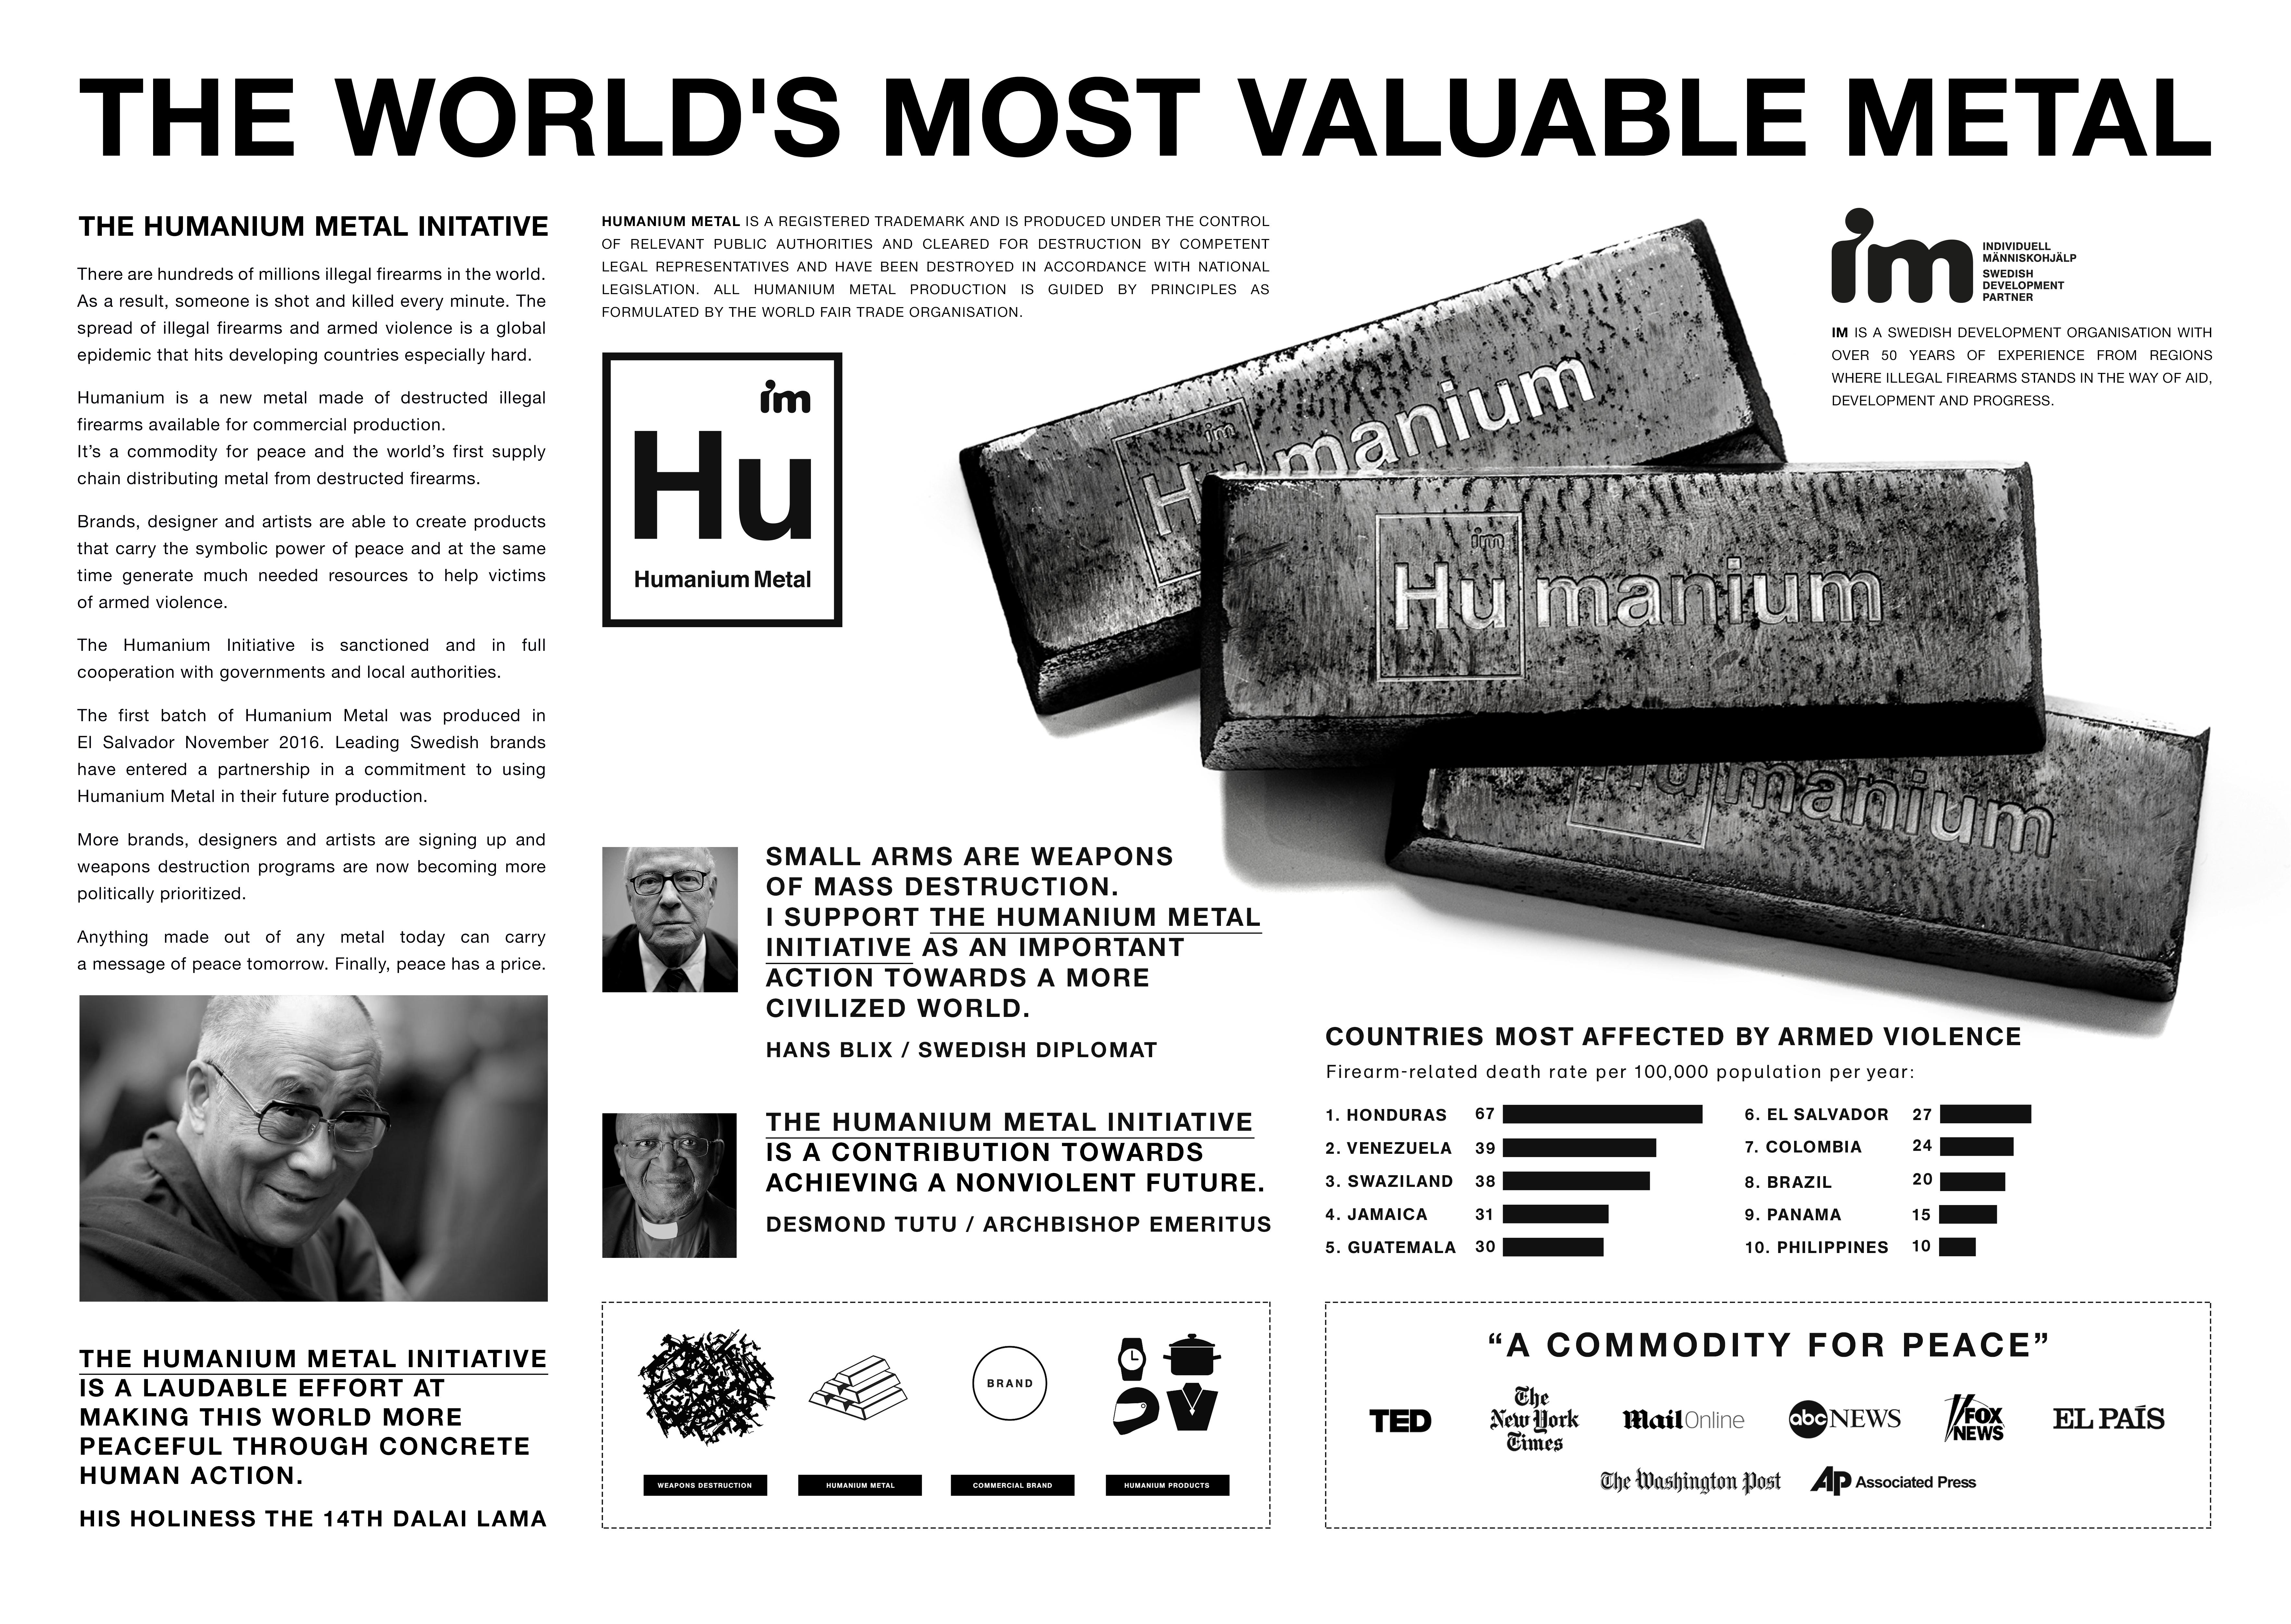 The Humanium Metal Initiative Thumbnail